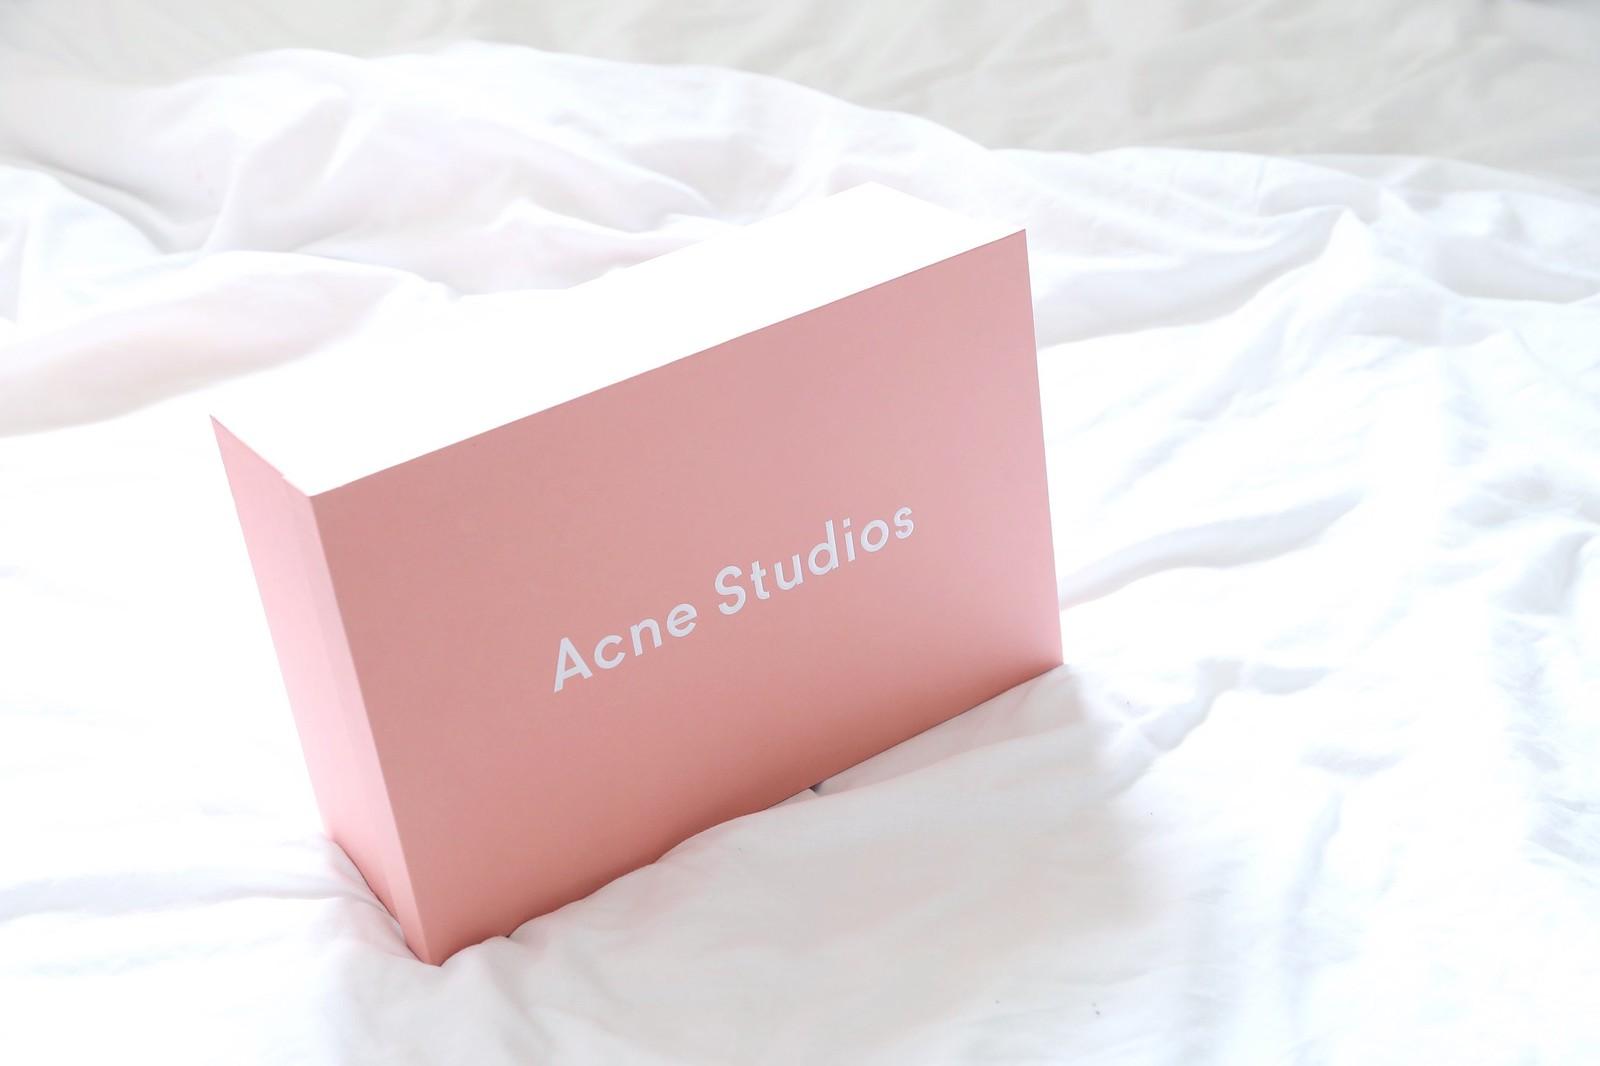 acnestudios, acnestudiosshoebox, krystelcouture, styleblogger, glasgowstyleblogger,